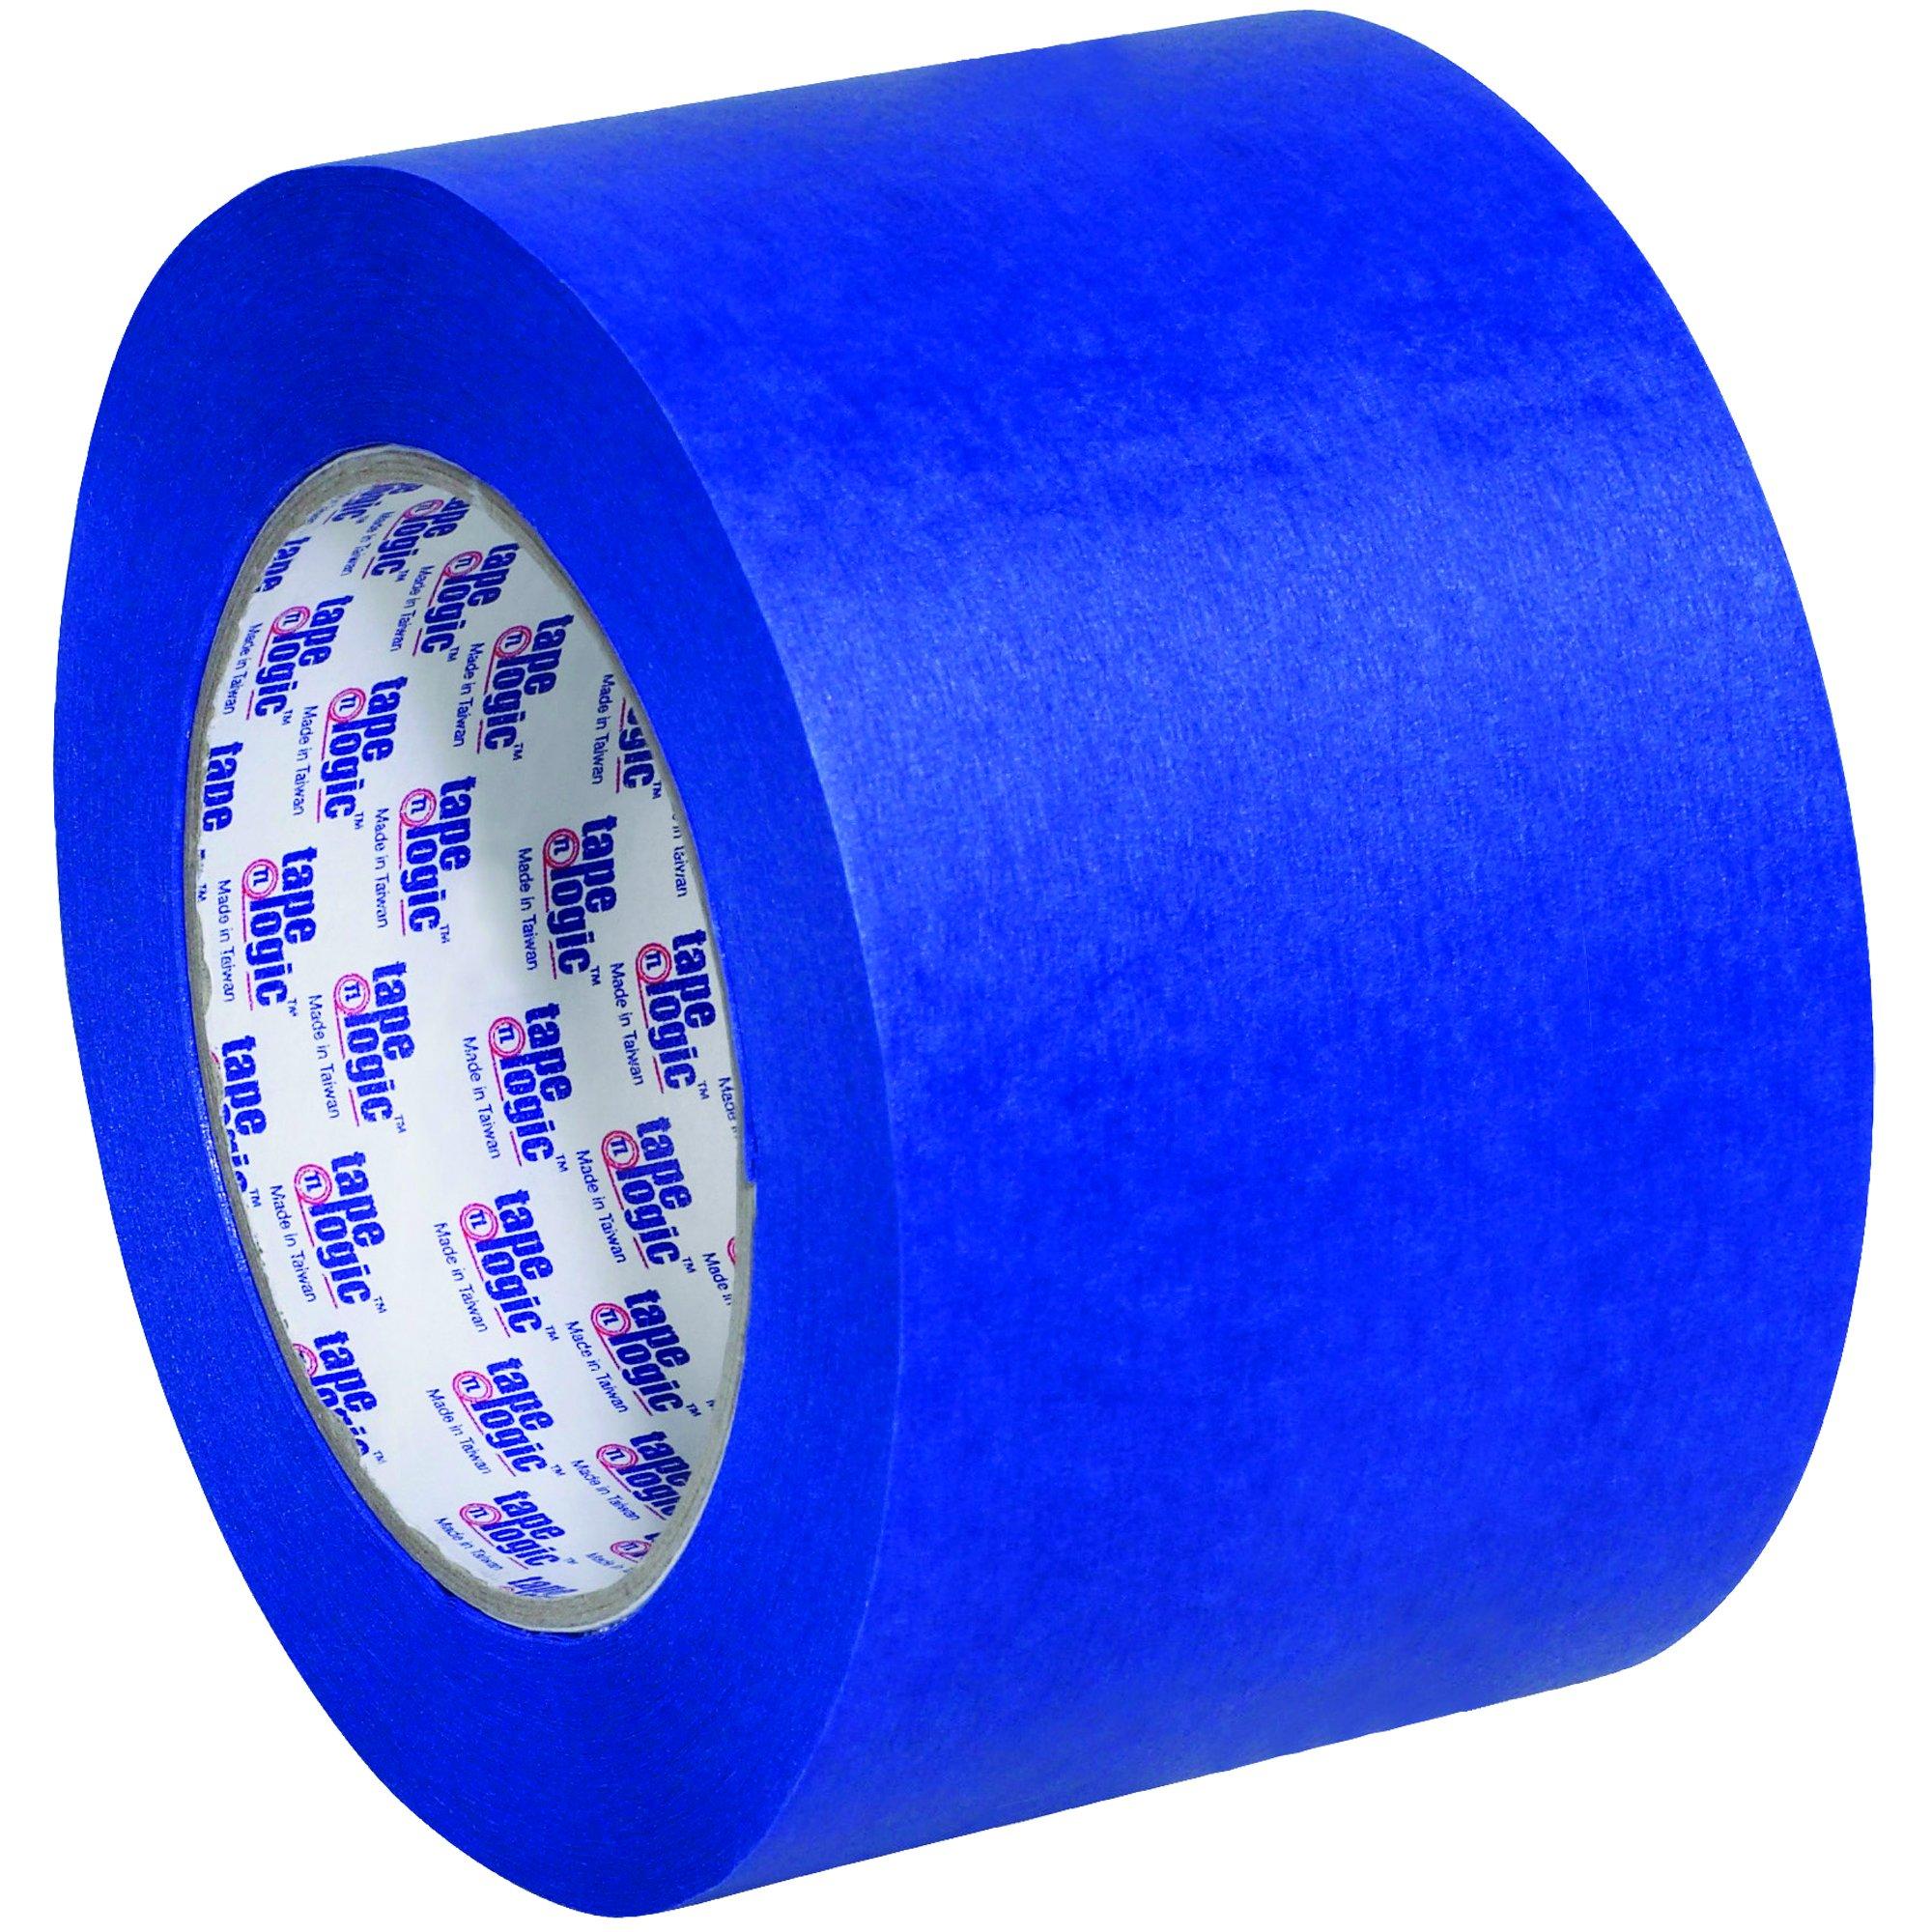 BOX USA BT9383000 Tape Logic 3000 Painter's Tape, 3'' x 60 yd., Blue (Pack of 16)